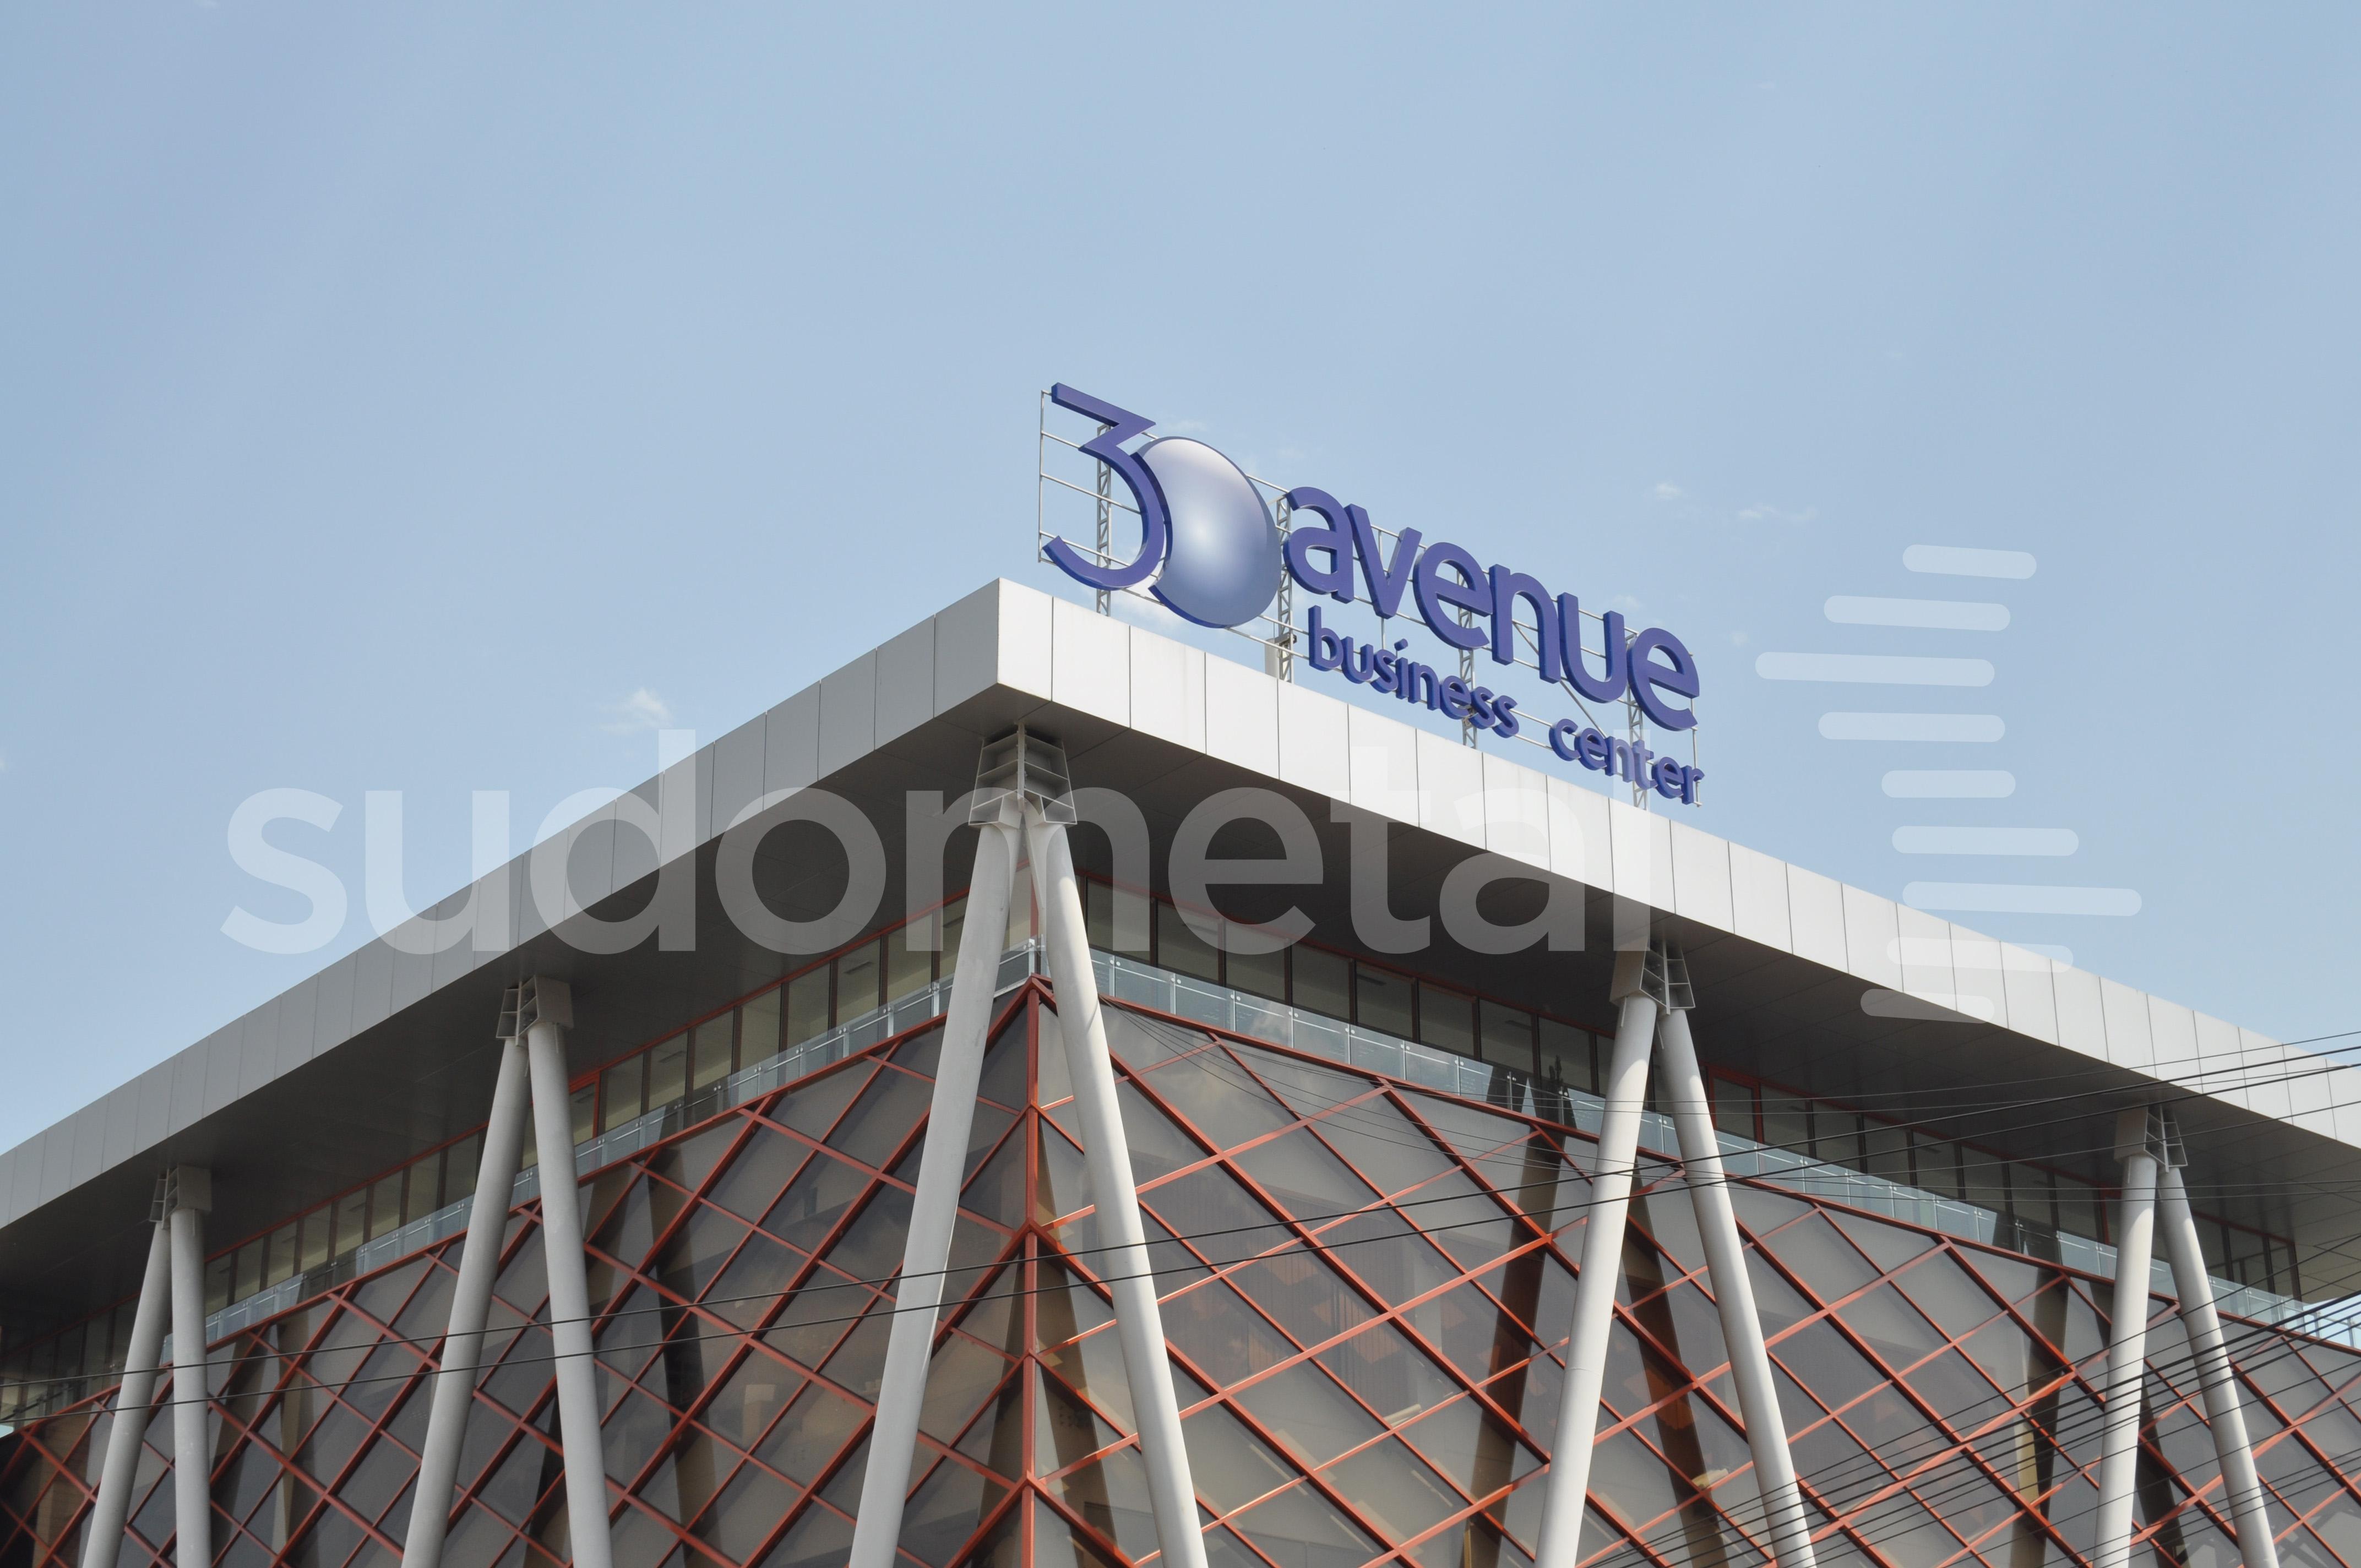 Balustrade exterioare - Balustrade cladire de birouri 30 Avenue, Bacau SUDOMETAL - Poza 1